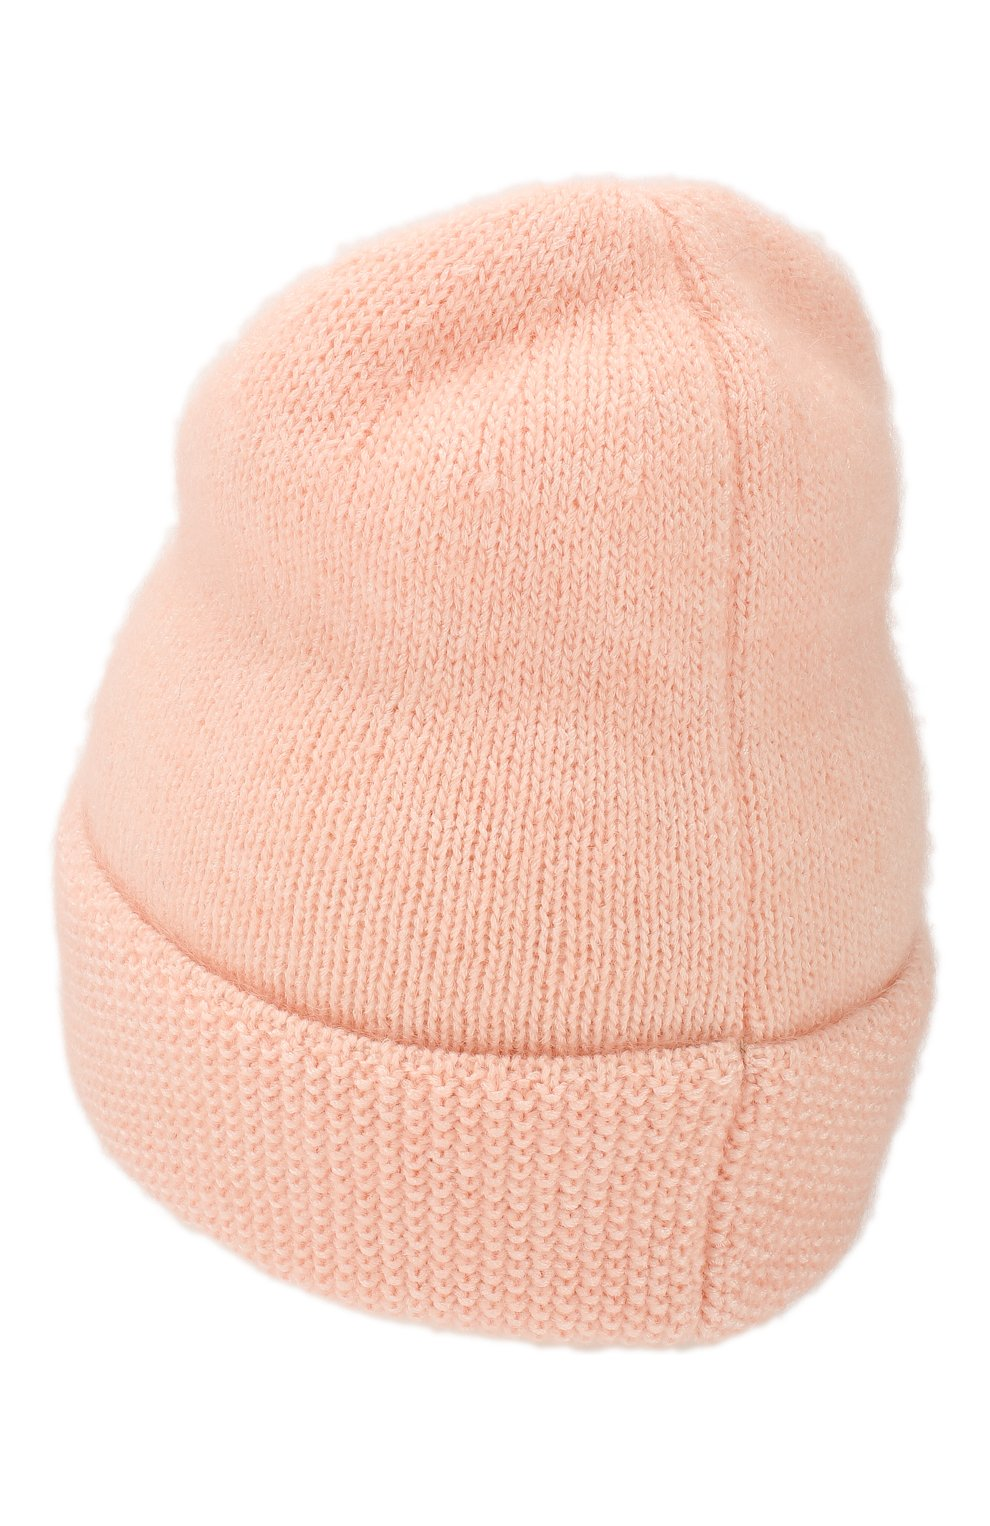 Женская шапка odette CANOE светло-розового цвета, арт. 4918466   Фото 2